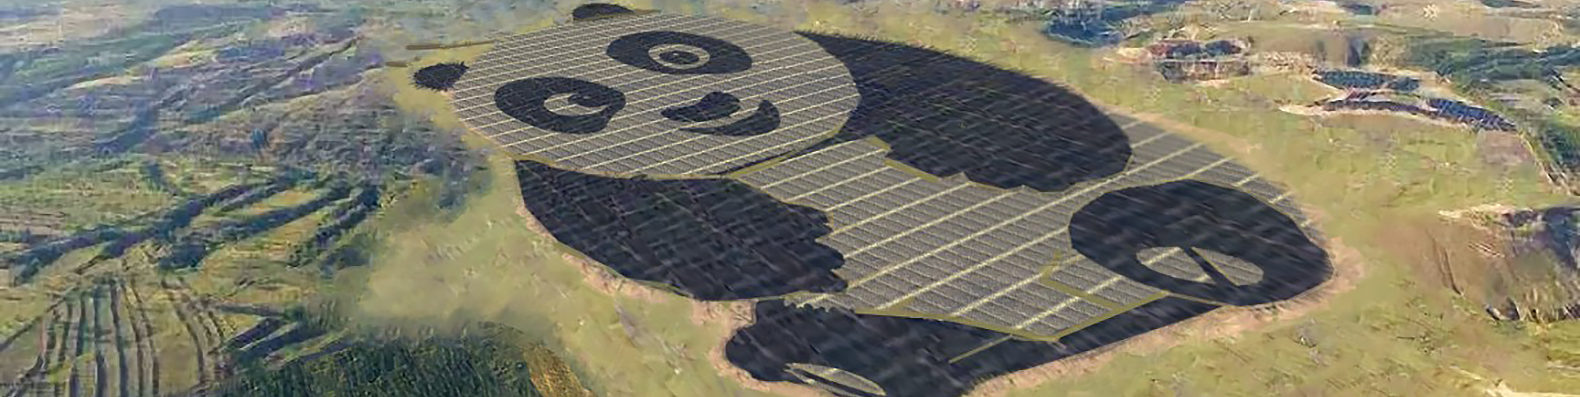 panda-green-energy-full-width-1580x397.jpg